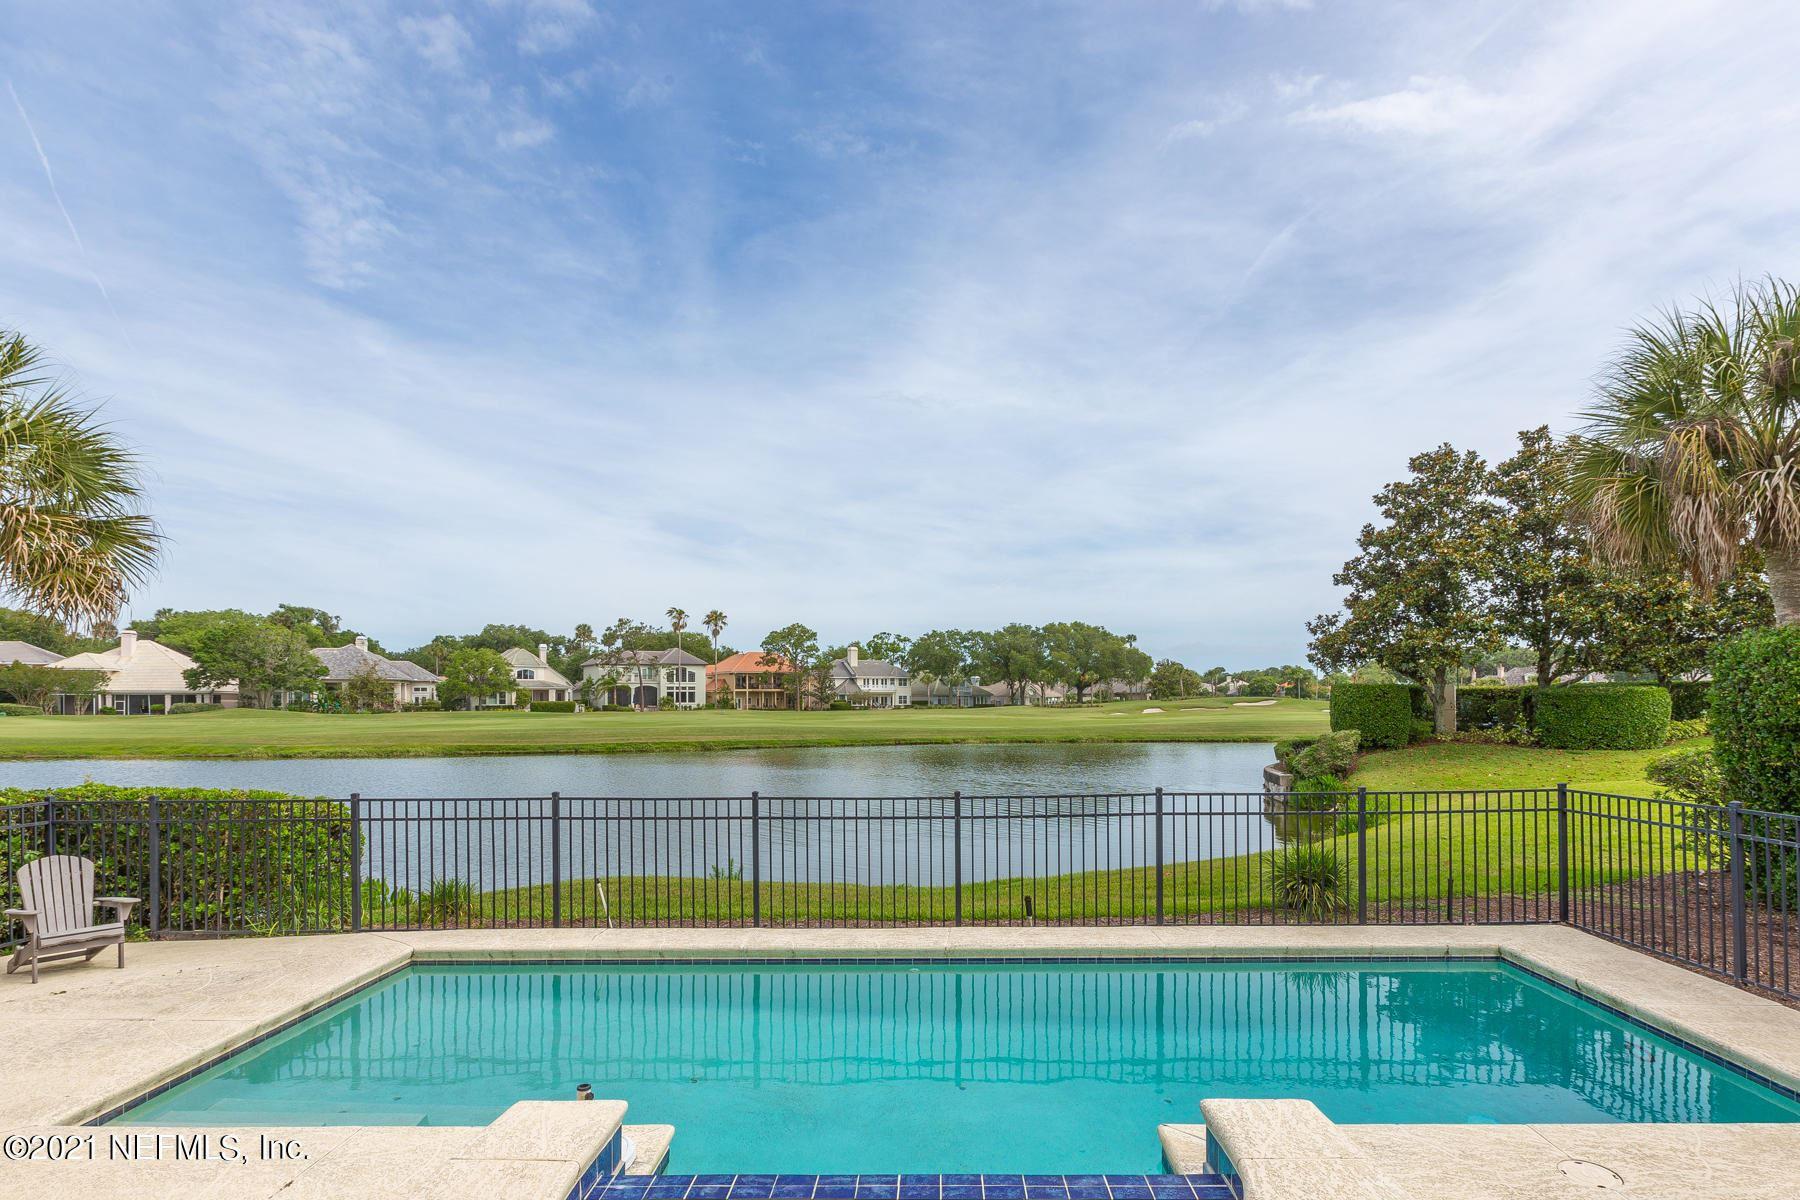 108 MELROSE CT, Ponte Vedra Beach, FL 32082 - MLS#: 1108949